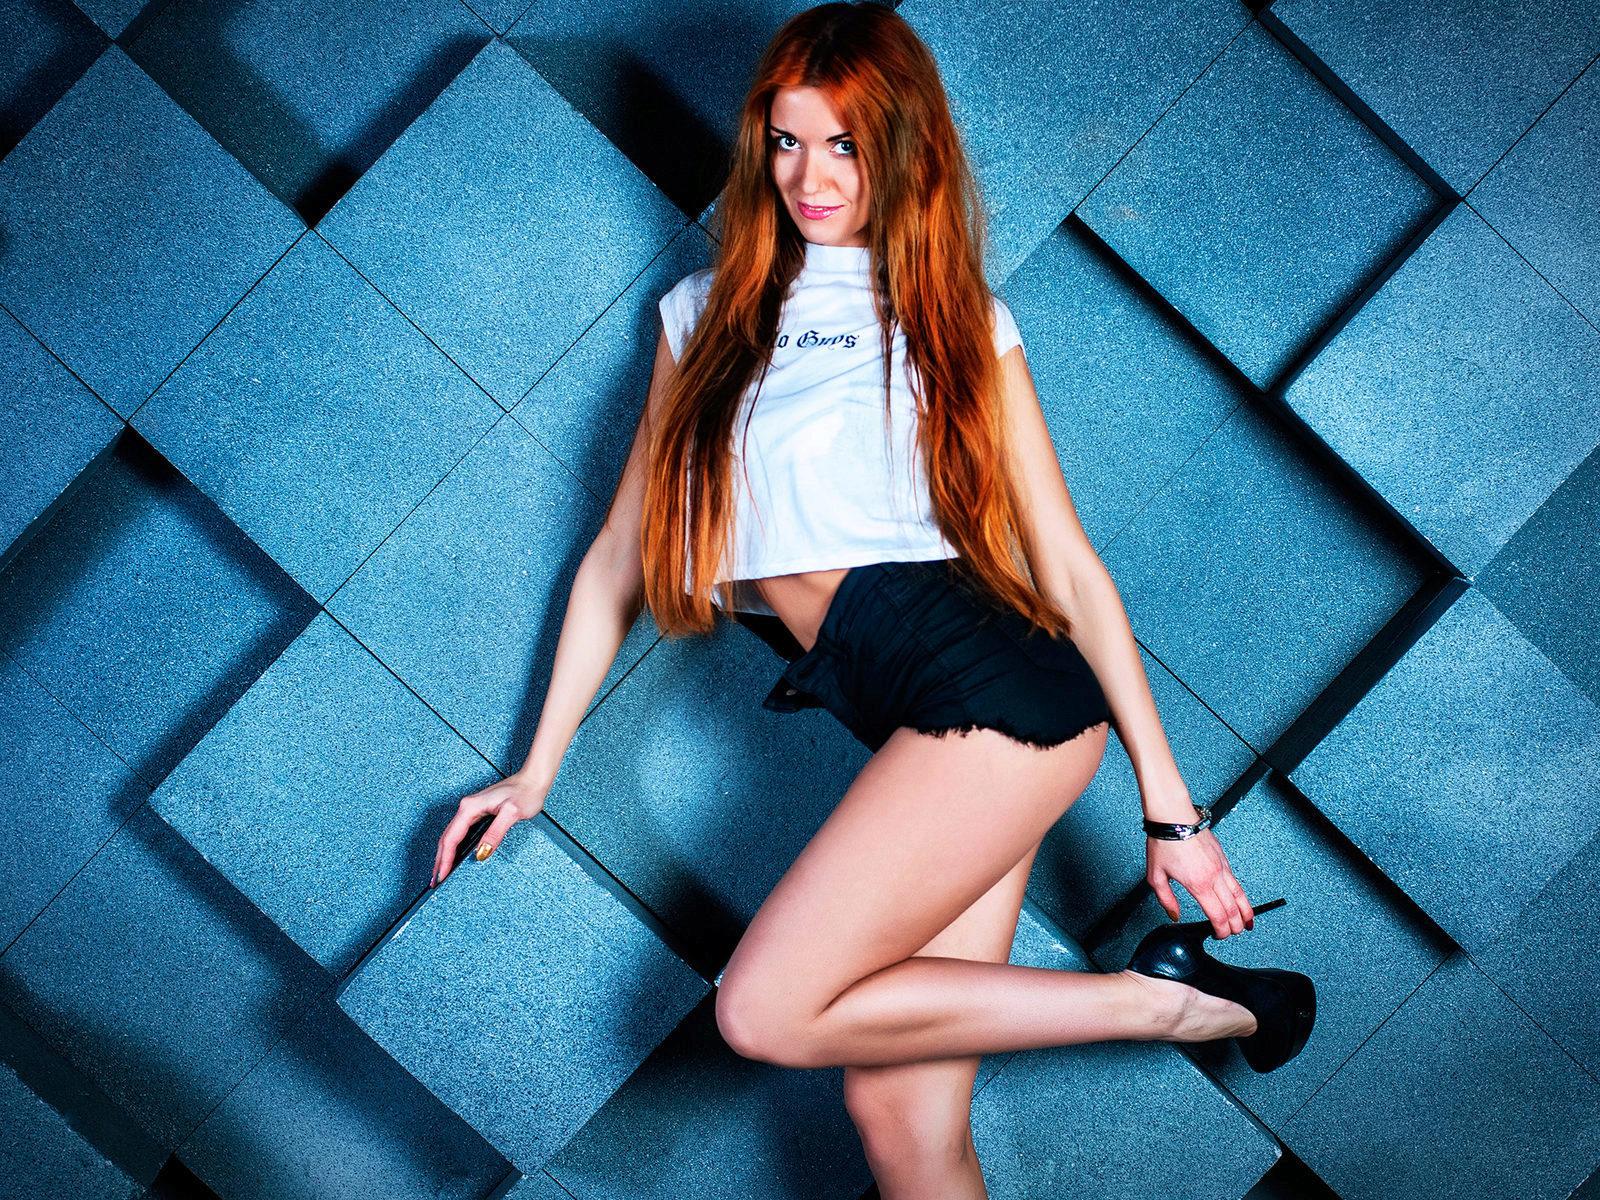 Webcam model Heather Kane from WebPowerCam